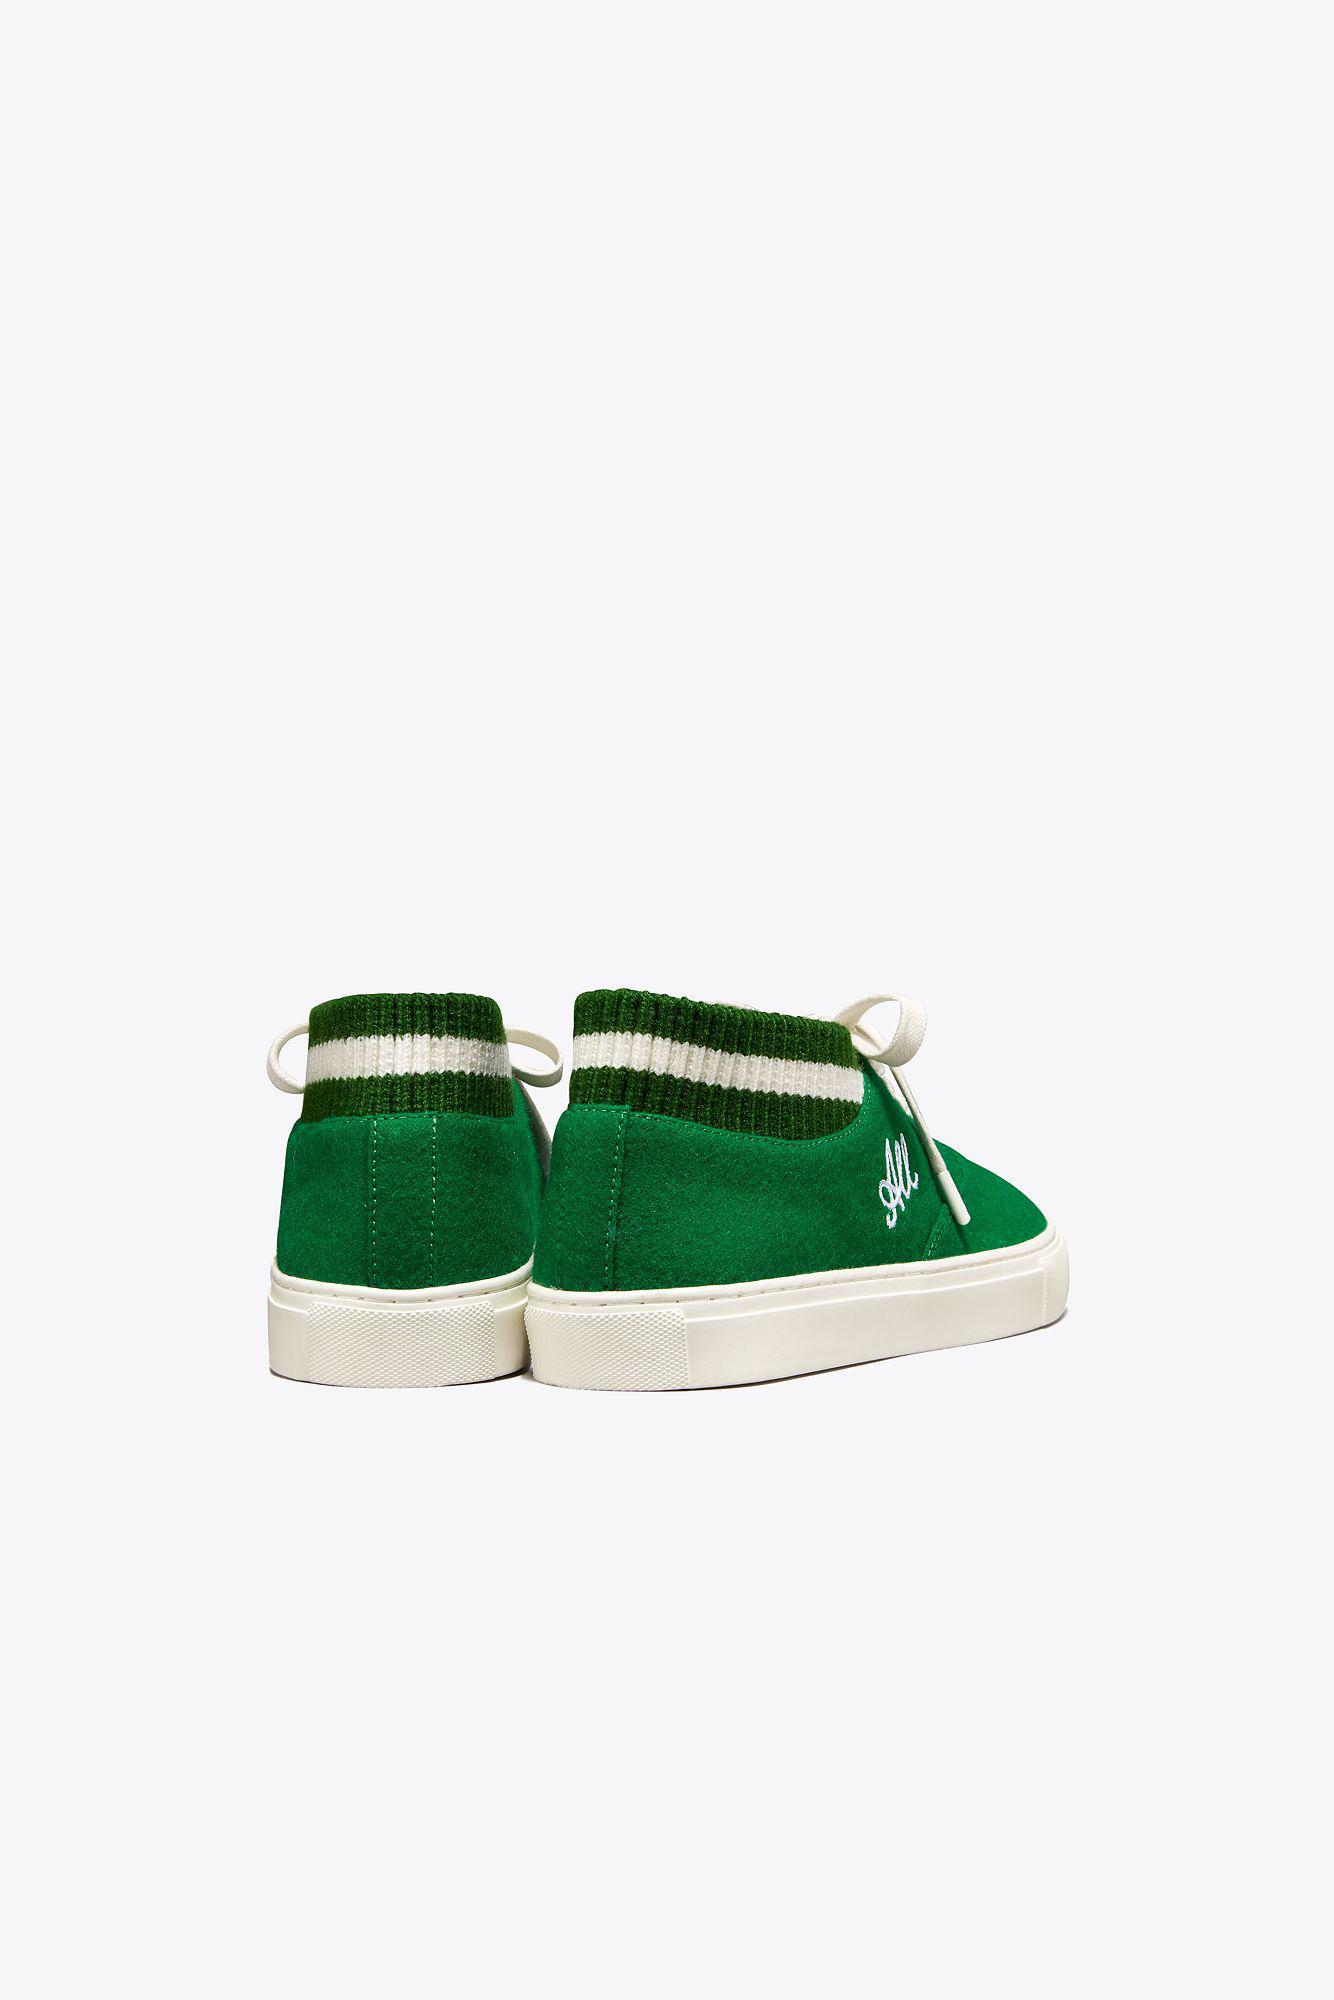 b8498728643b97 ... Tory Burch Love All Sneakers - Lyst. View fullscreen